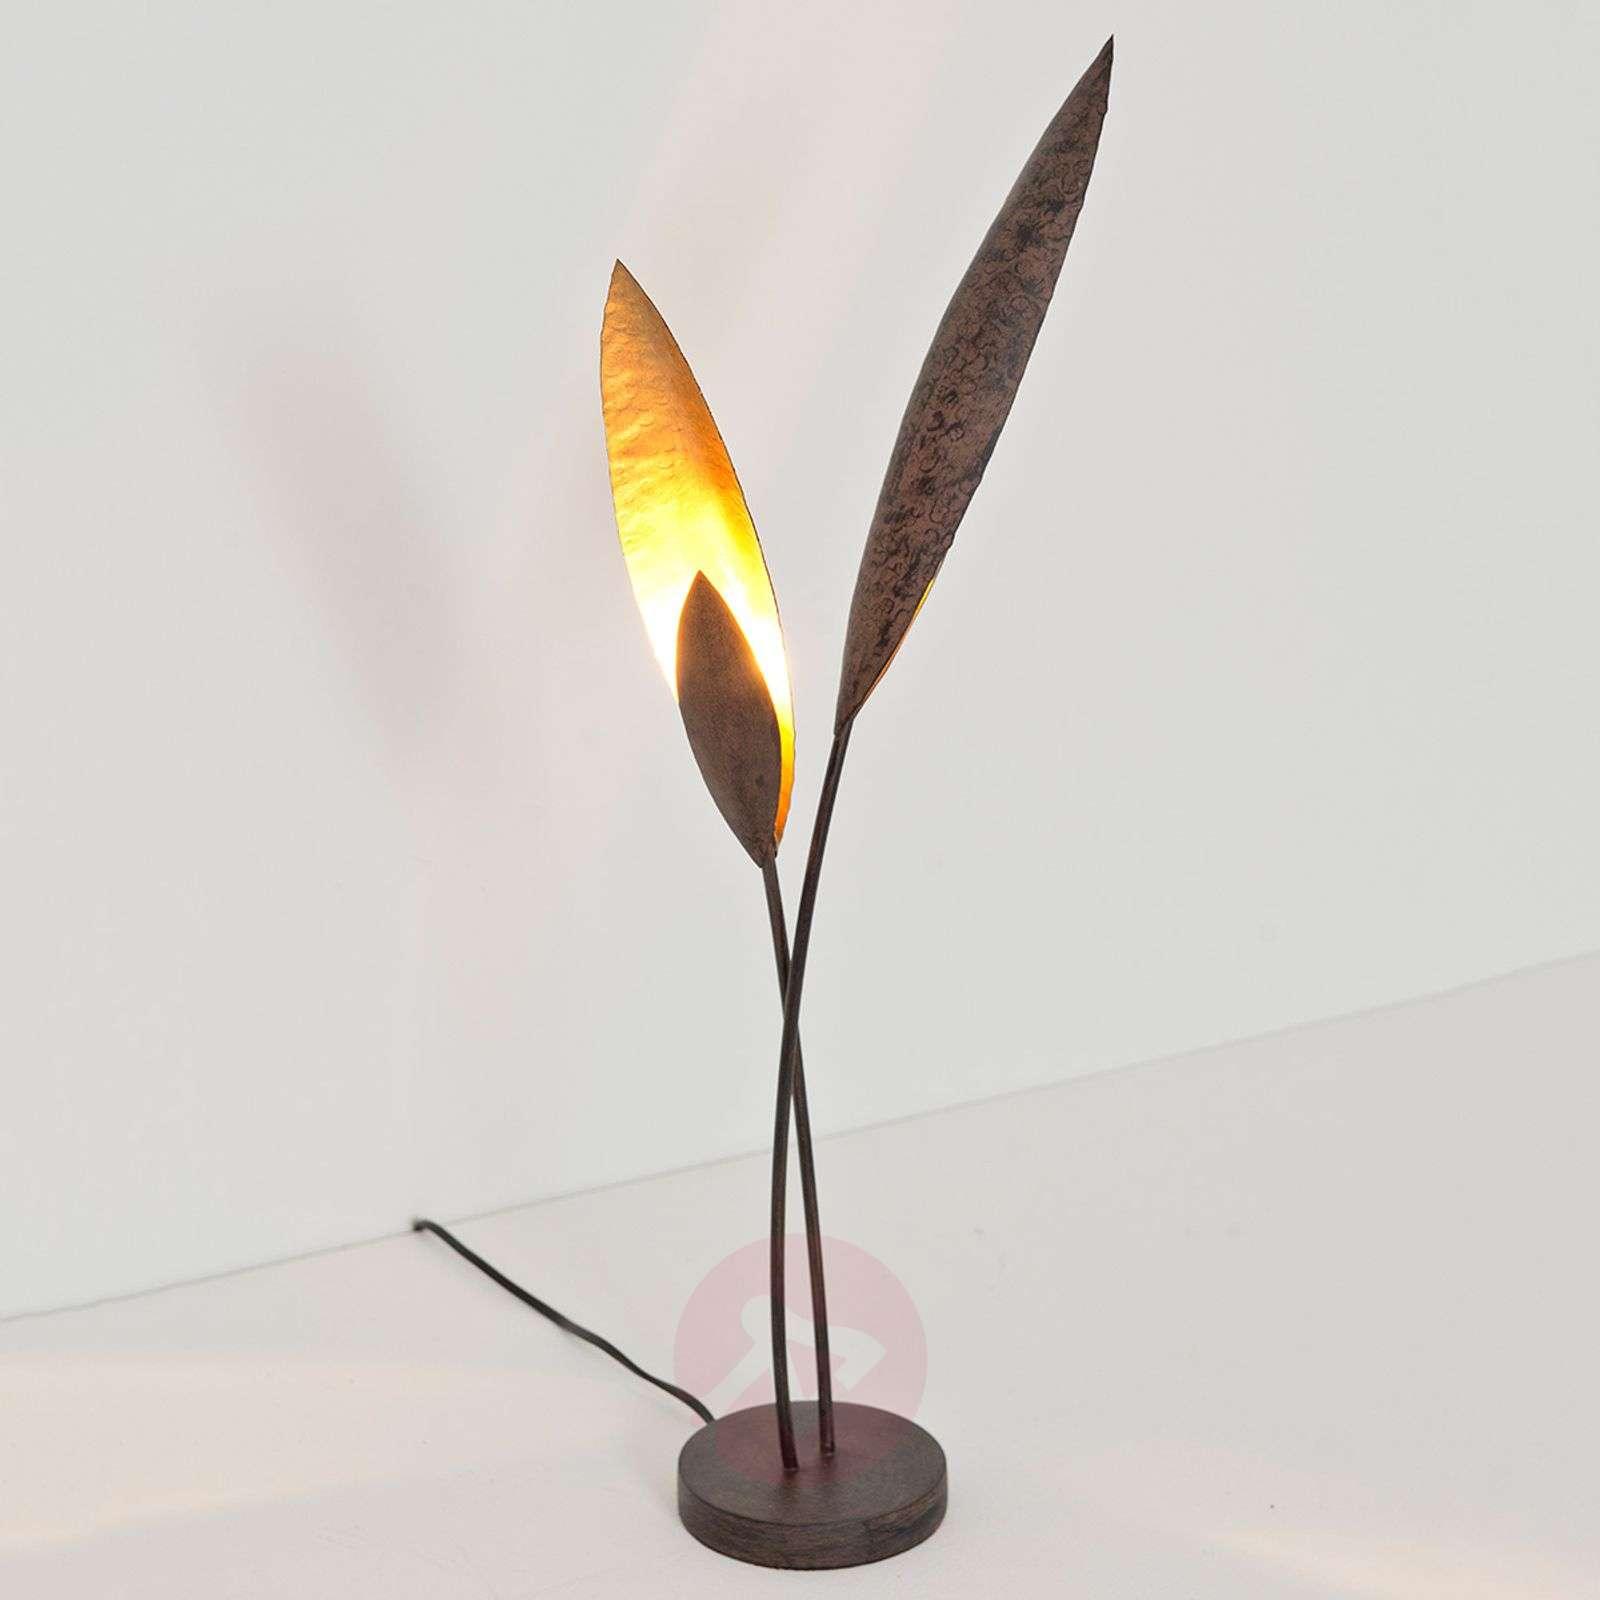 Strelicie – hieno LED-pöytävalaisin-4512499-01